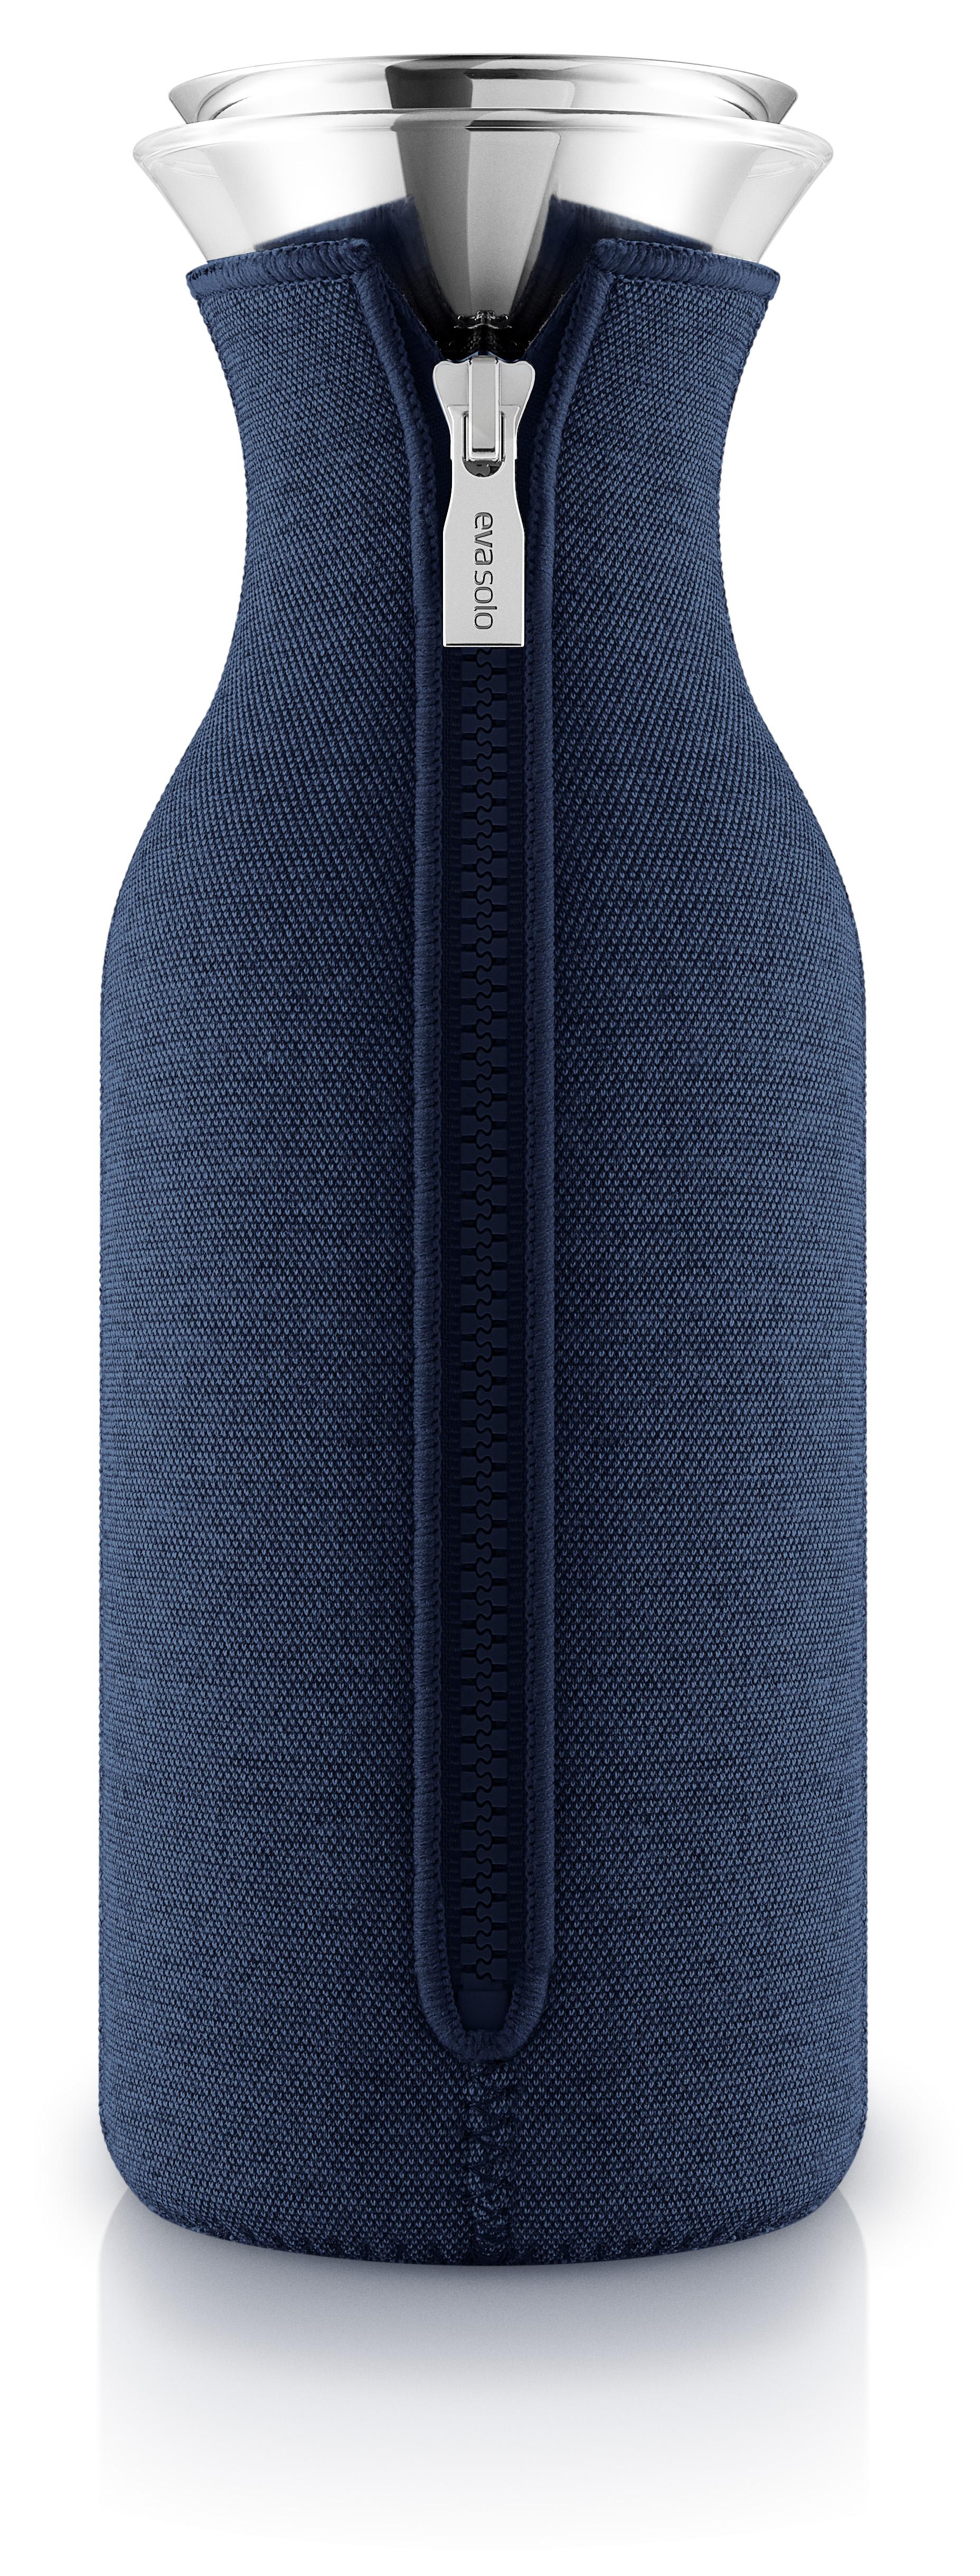 Eva Solo - Fridge Carafe 1 L - Navy Blue Woven (567976)